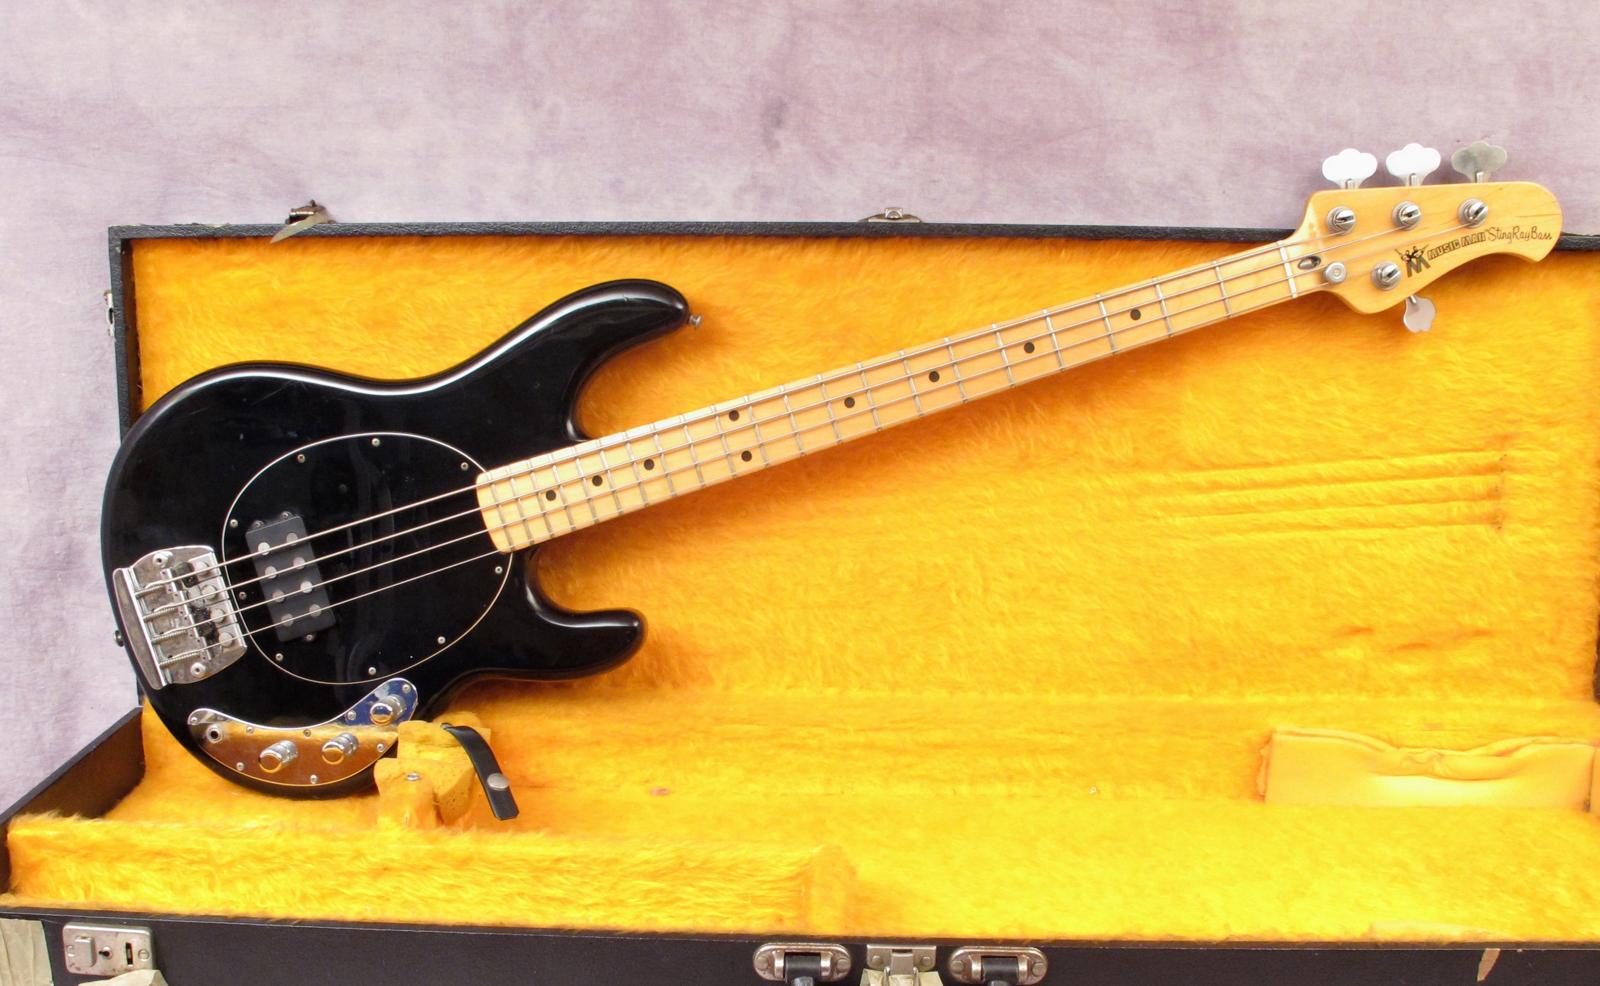 music man stingray 1977 black bass for sale andy baxter bass guitars ltd. Black Bedroom Furniture Sets. Home Design Ideas